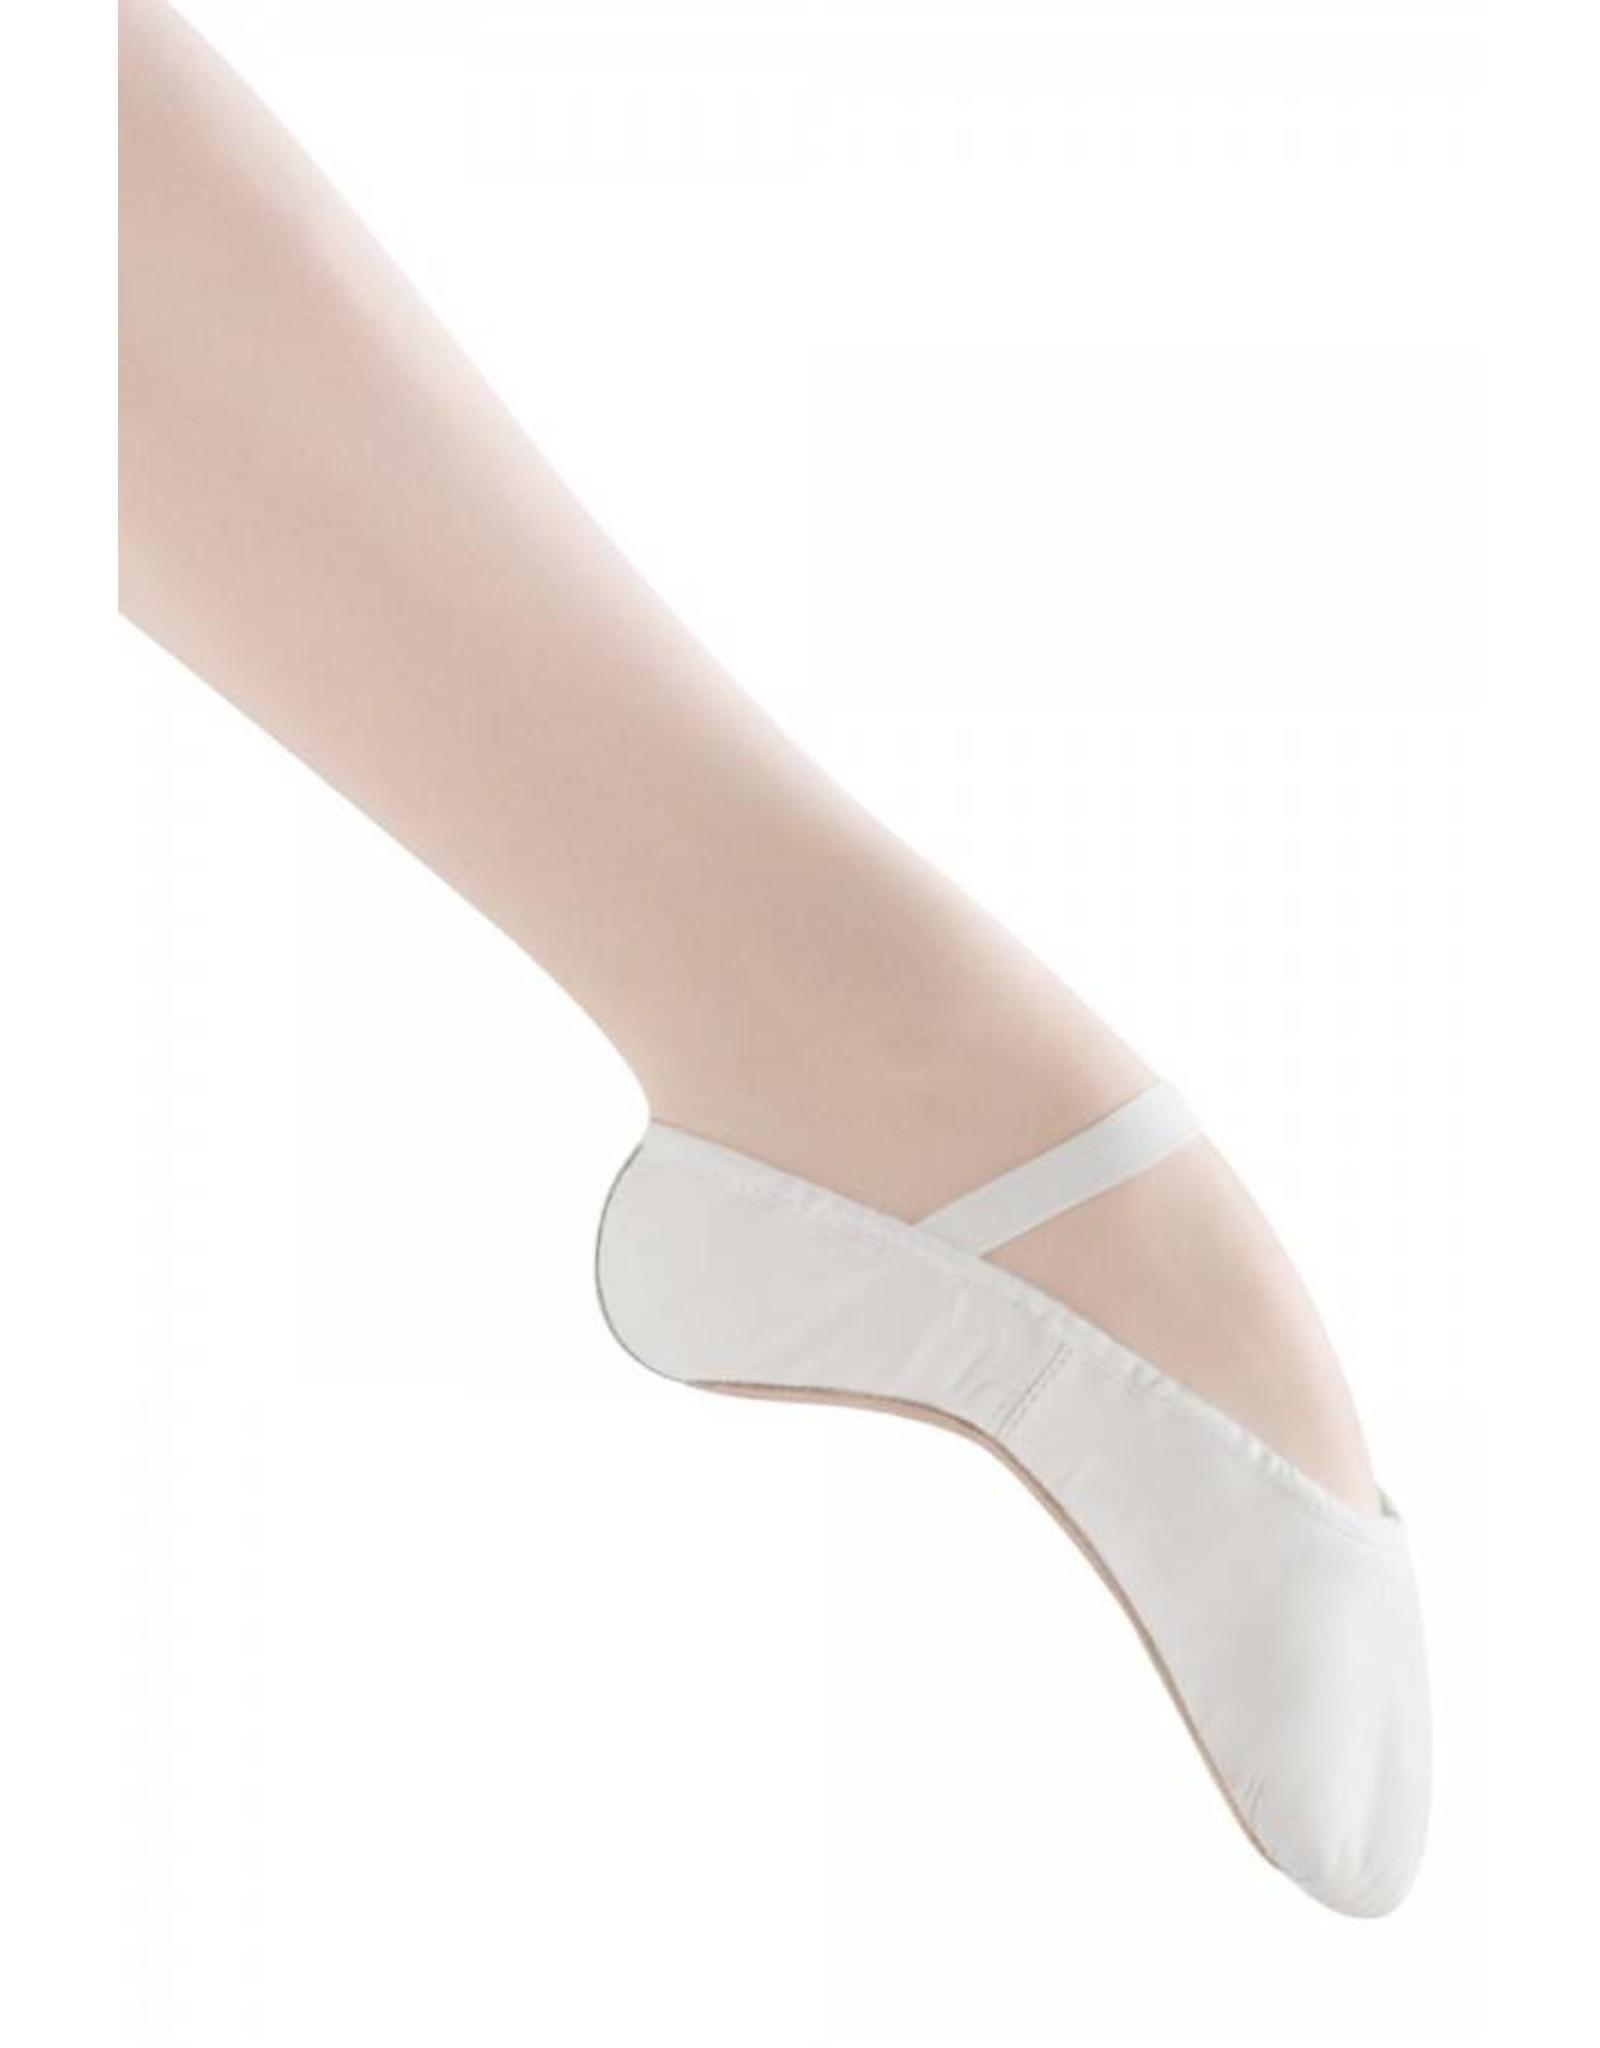 Bloch S0205G Full sole Leather Ballet Shoe WHITE